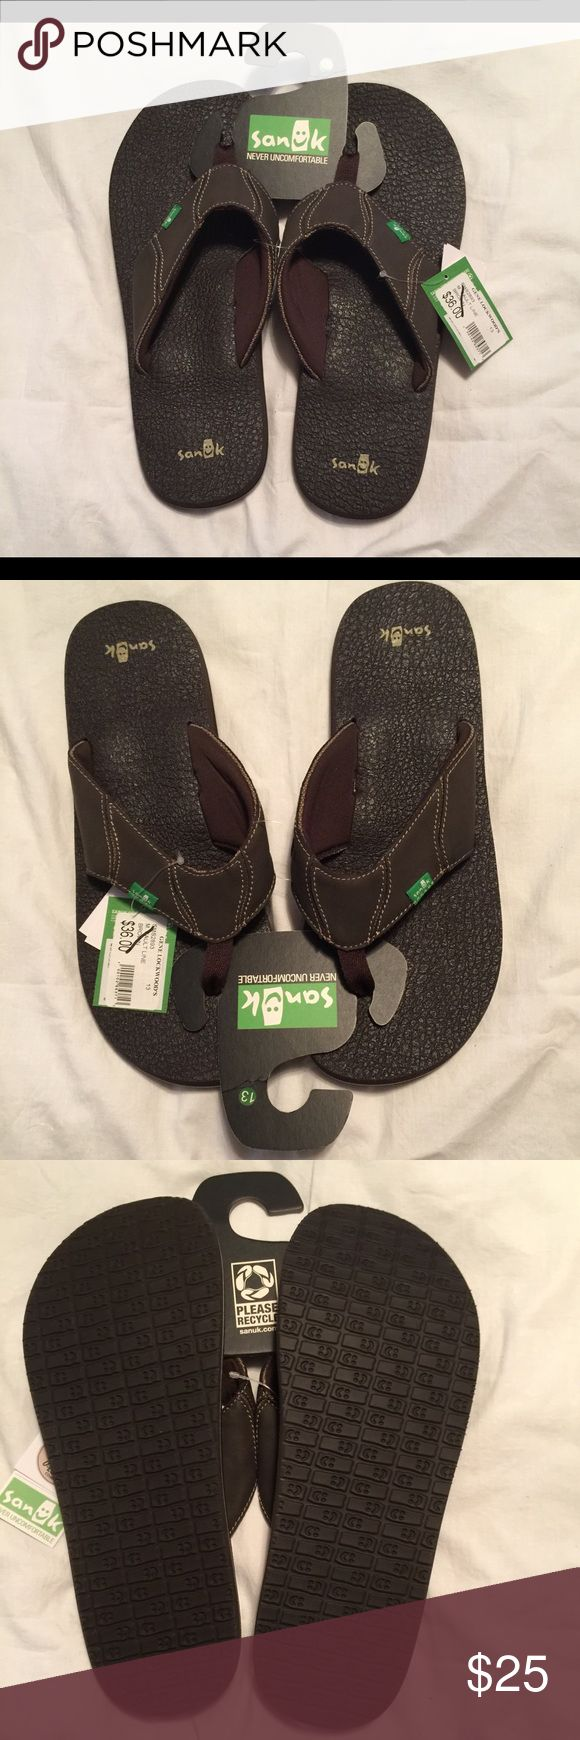 Men's Sanuk Flip flops Brown with yoga mat soles. So comfortable. BNWT! Sanuk Shoes Sandals & Flip-Flops